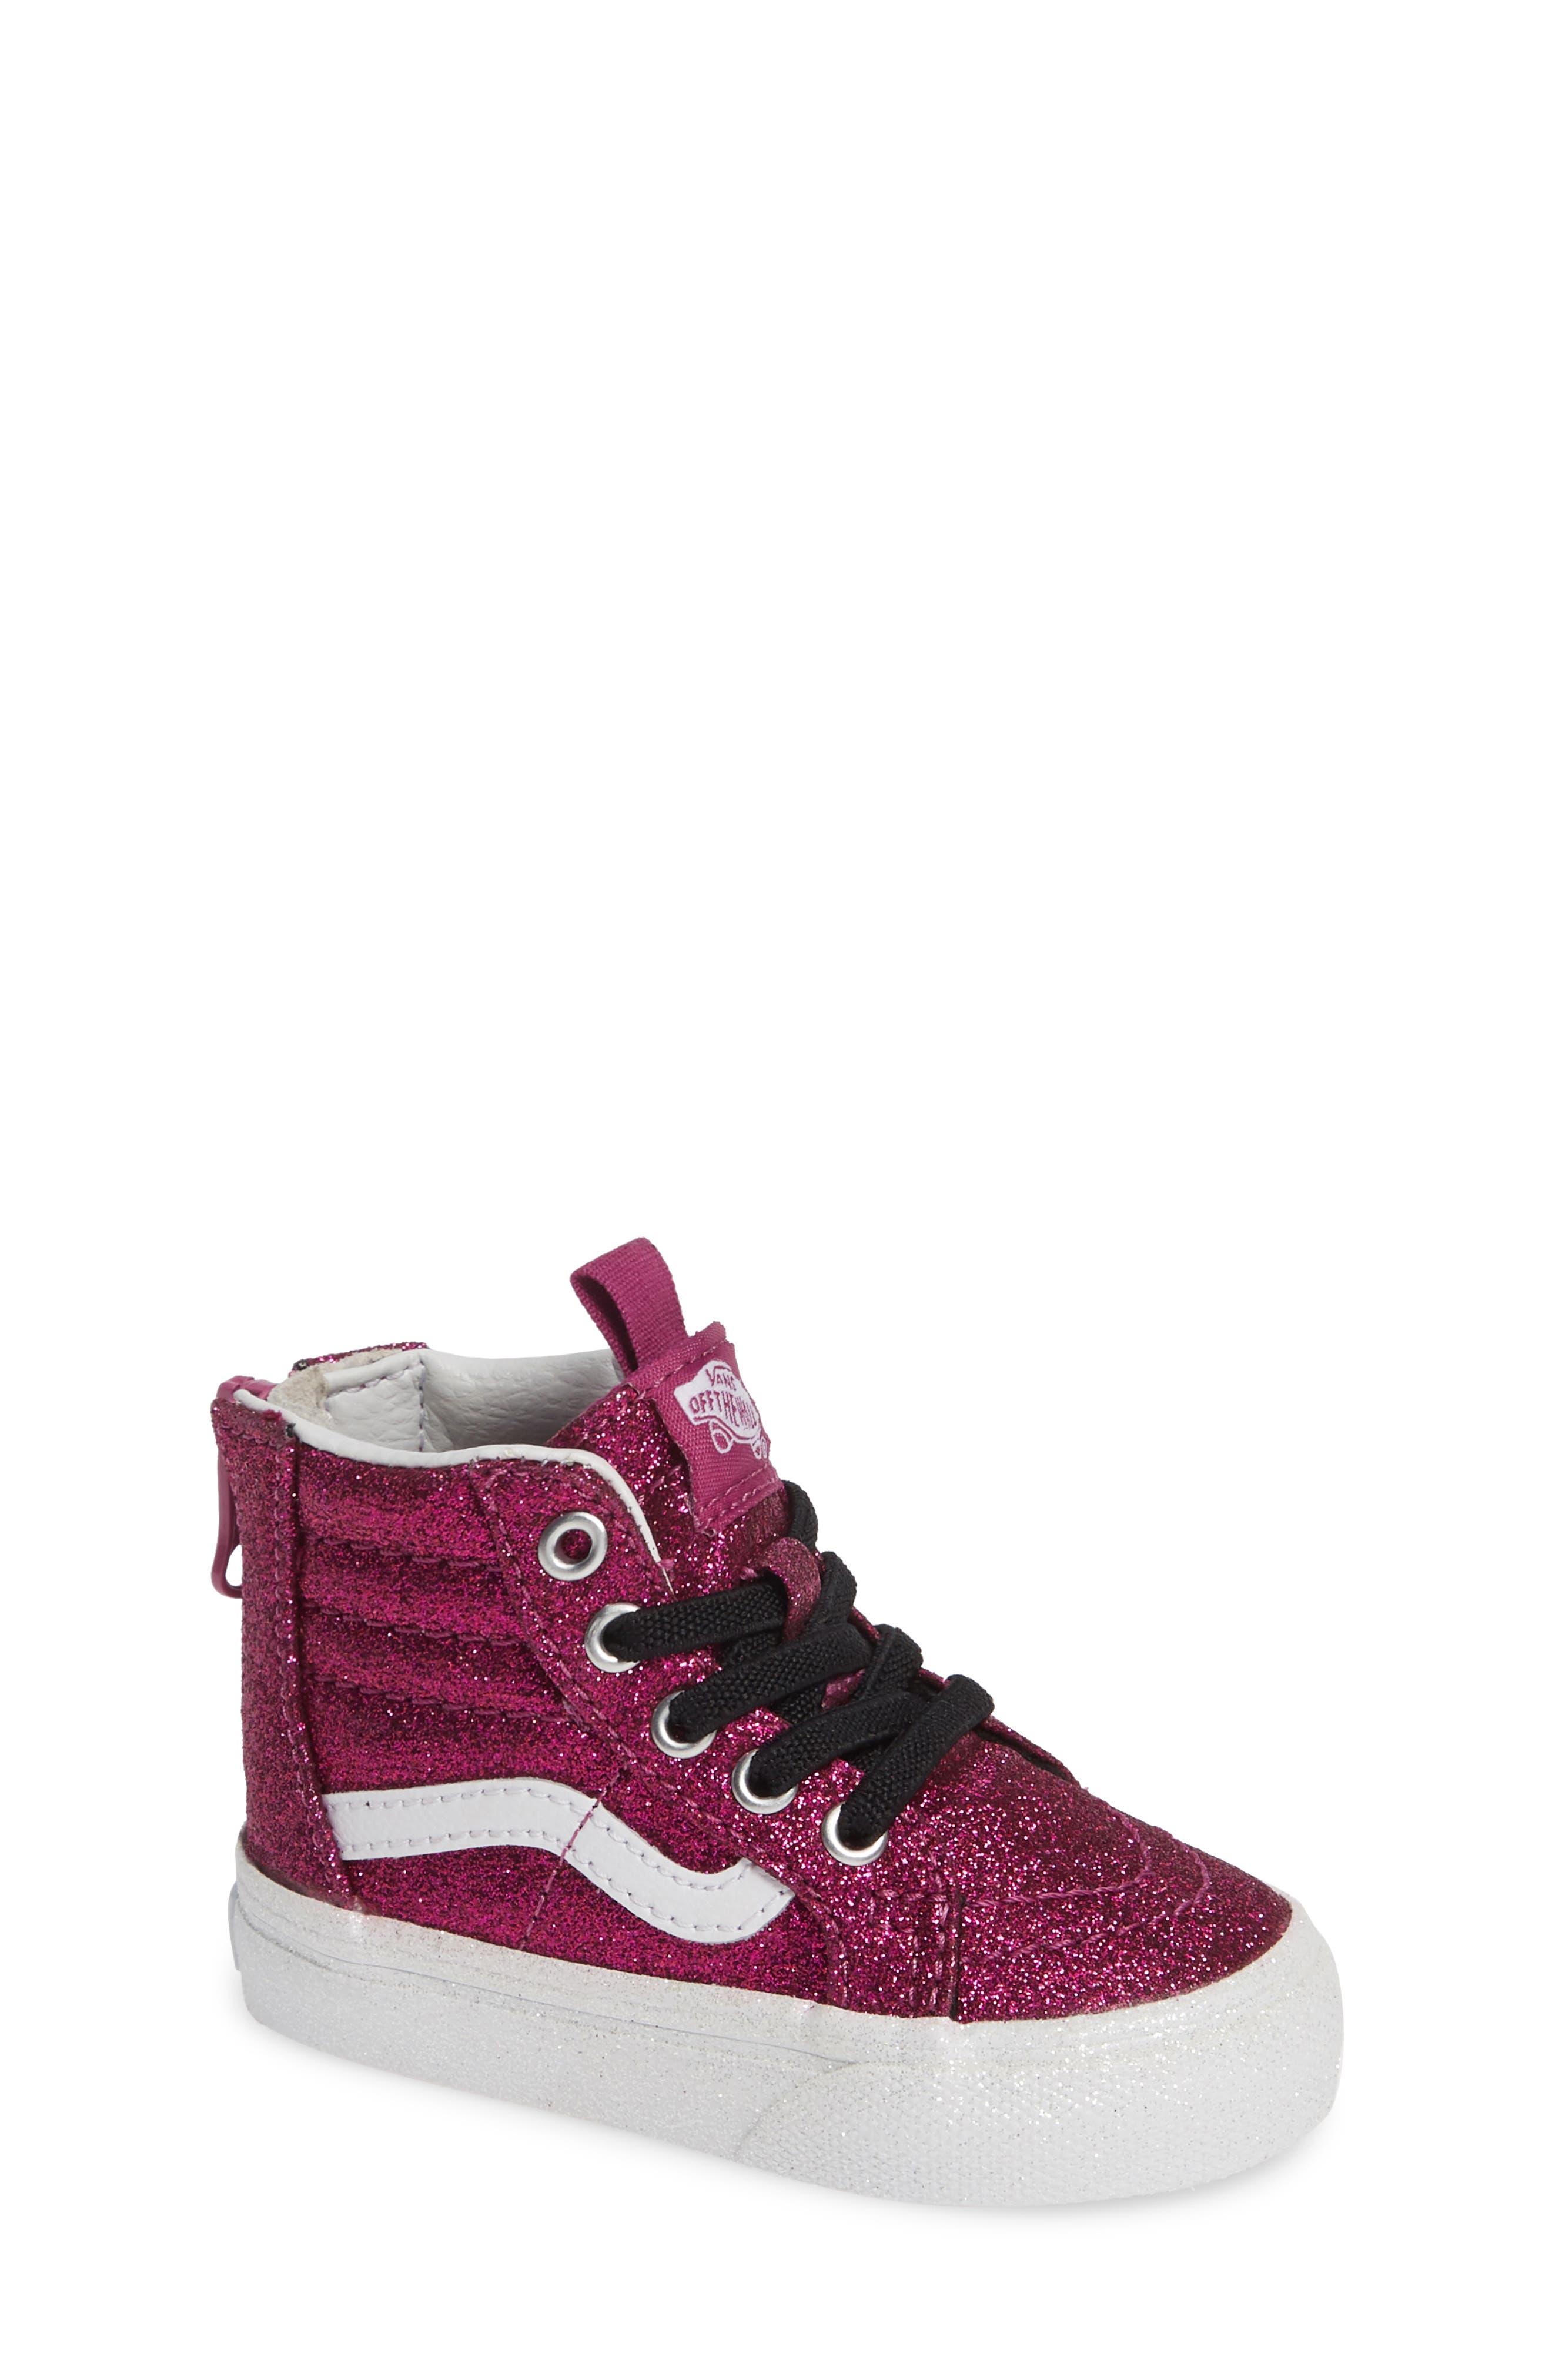 SK8-Hi Zip Sneaker,                         Main,                         color, WILD ASTER/ TRUE WHITE